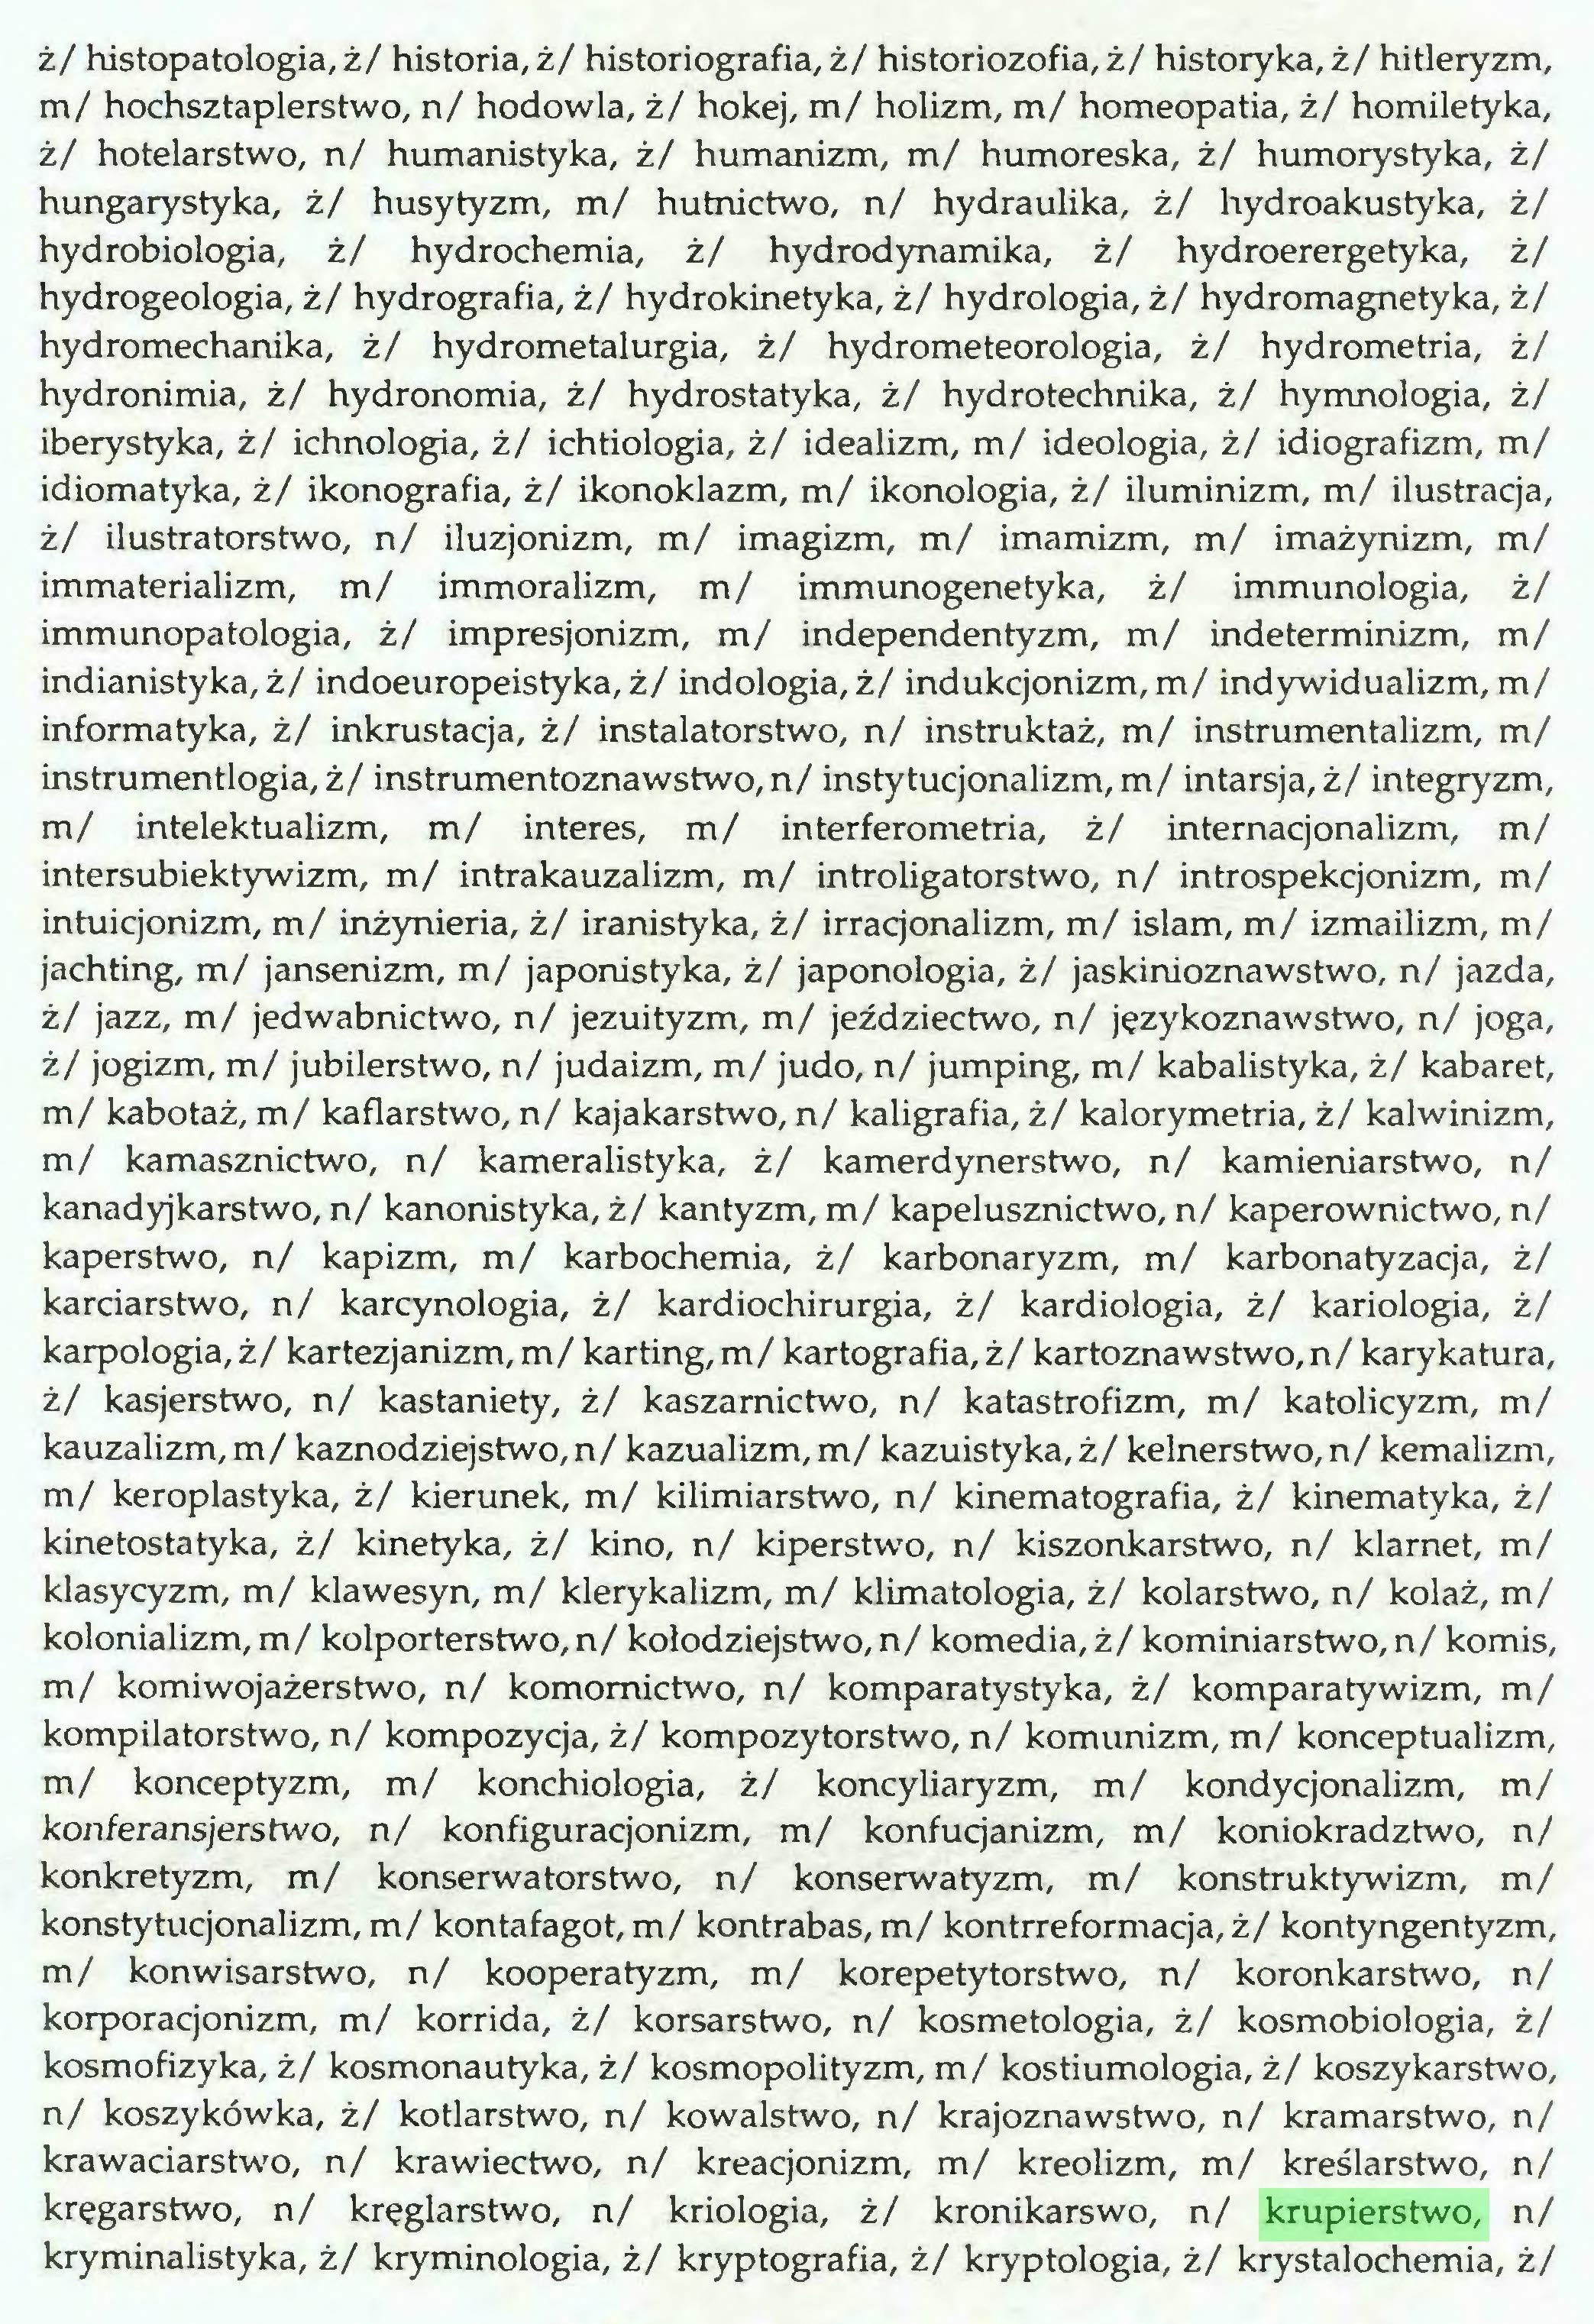 (...) ż/ histopatologia, ż/ historia, ż/ historiografia, ż/ historiozofia, ż/ historyka, ż/ hitleryzm, m/ hochsztaplerstwo, n/ hodowla, ż/ hokej, m/ holizm, m/ homeopatia, ż/ homiletyka, ż/ hotelarstwo, n/ humanistyka, ż/ humanizm, m/ humoreska, ż/ humorystyka, ż/ hungarystyka, ż/ husytyzm, m/ hutnictwo, n/ hydraulika, ż/ hydroakuśtyka, ż/ hydrobiologia, ż/ hydrochemia, ż/ hydrodynamika, ż/ hydroerergetyka, ż/ hydrogeologia, ż/ hydrografia, ż/ hydrokinetyka, ż/ hydrologia, ż/ hydromagnetyka, ż/ hydromechanika, ż/ hydrometalurgia, ż/ hydrometeorologia, ż/ hydrometria, ż/ hydronimia, ż/ hydronomia, ż/ hydrostatyka, ż/ hydrotechnika, ż/ hymnologia, ż/ iberystyka, ż/ ichnologia, ż/ ichtiologia, ż/ idealizm, m/ ideologia, ż/ idiografizm, m/ idiomatyka, ż/ ikonografia, ż/ ikonoklazm, m/ ikonologia, ż/ iluminizm, m/ ilustracja, ż/ ilustratorstwo, n/ iluzjonizm, m/ imagizm, m/ imamizm, m/ imażynizm, m/ immaterializm, m/ immoralizm, m/ immunogenetyka, ż/ immunologia, ż/ immunopatologia, ż/ impresjonizm, m/ independentyzm, m/ indeterminizm, m/ indianistyka, ż/ indoeuropeistyka, ż/ indologia, ż/ indukcjonizm, m/ indywidualizm, m/ informatyka, ż/ inkrustacja, ż/ instalatorstwo, n/ instruktaż, m/ instrumentalizm, m/ instrumentlogia, ż/ instrumentoznawstwo, n/ instytucjonalizm, m/ intarsja, ż/ integryzm, m/ intelektualizm, m/ interes, m/ interferometria, ż/ internacjonalizm, m/ intersubiektywizm, m/ intrakauzalizm, m/ introligatorstwo, n/ introspekcjonizm, m/ intuicjonizm, m/ inżynieria, ż/ iranistyka, ż/ irracjonalizm, m/ islam, m/ izmailizm, m/ jachting, m/ jansenizm, m/ japonistyka, ż/ japonologia, ż/ jaskinioznawstwo, n/ jazda, ż/ jazz, m/ jedwabnictwo, n/ jezuityzm, m/ jeździectwo, n/ językoznawstwo, n/ joga, ż/ jogizm, m/ jubilerstwo, n/ judaizm, m/ judo, n/ jumping, m/ kabalistyka, ż/ kabaret, m/ kabotaż, m/ kaflarstwo, n/ kajakarstwo, n/ kaligrafia, ż/ kalorymetria, ż/ kalwinizm, m/ kamasznictwo, n/ kameralistyka, ż/ kamerdynerstwo, n/ kamieniarstwo, n/ kanadyjkarstwo, n/